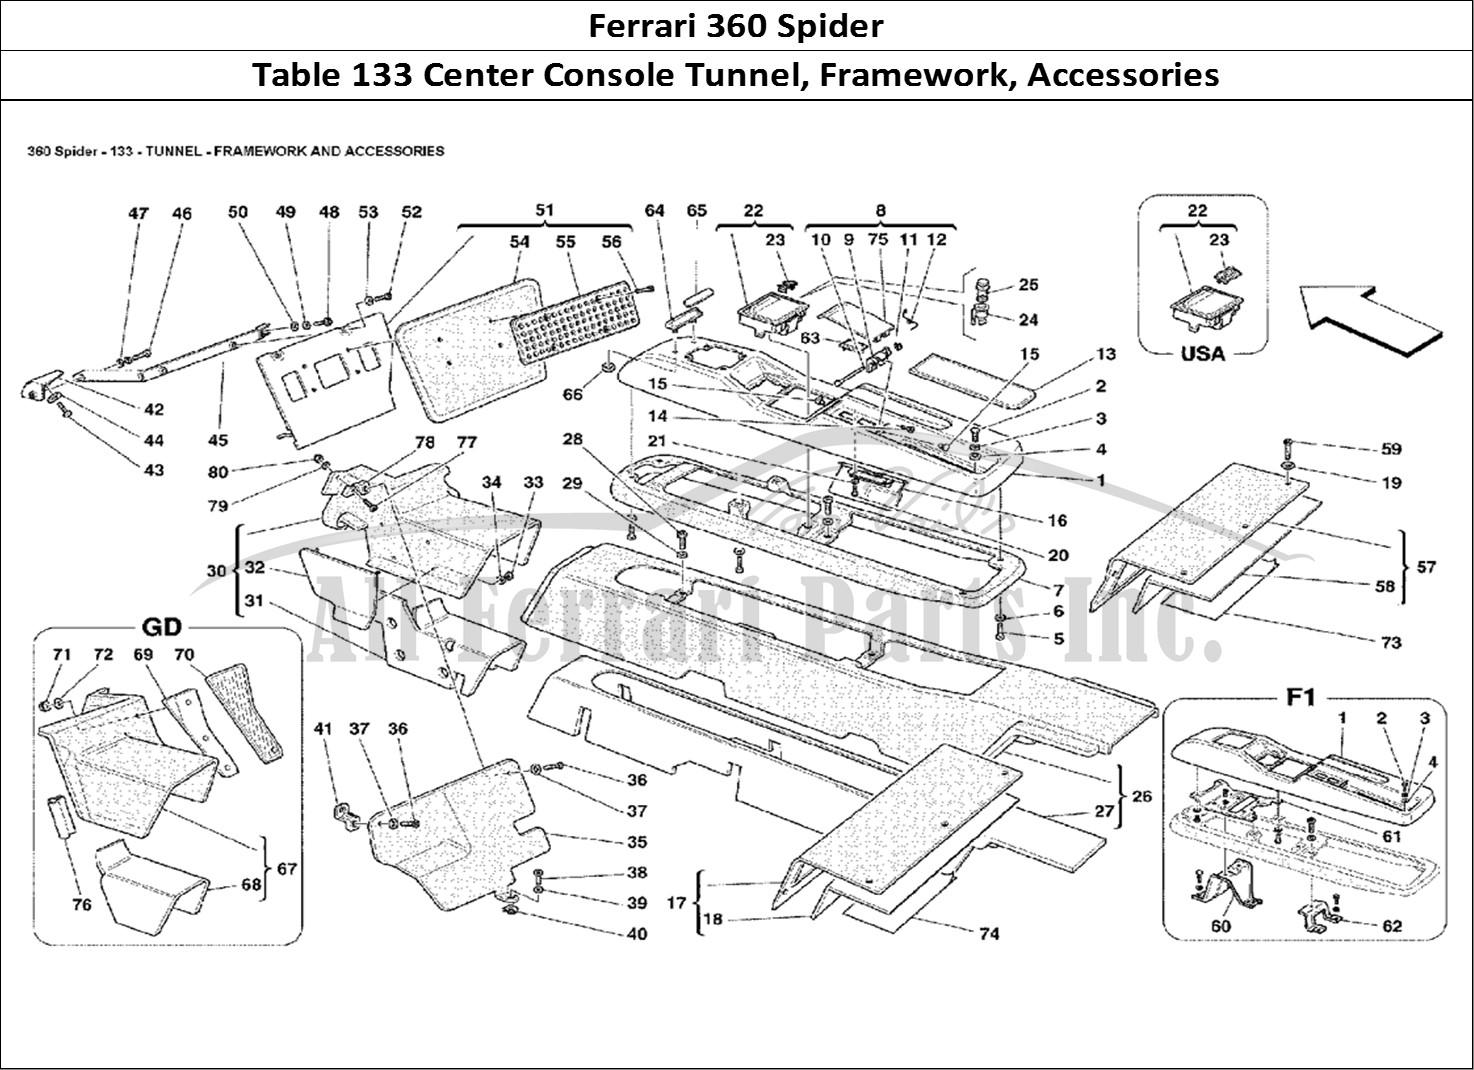 buy original ferrari 360 spider 133 center console tunnel  framework  accessories ferrari parts